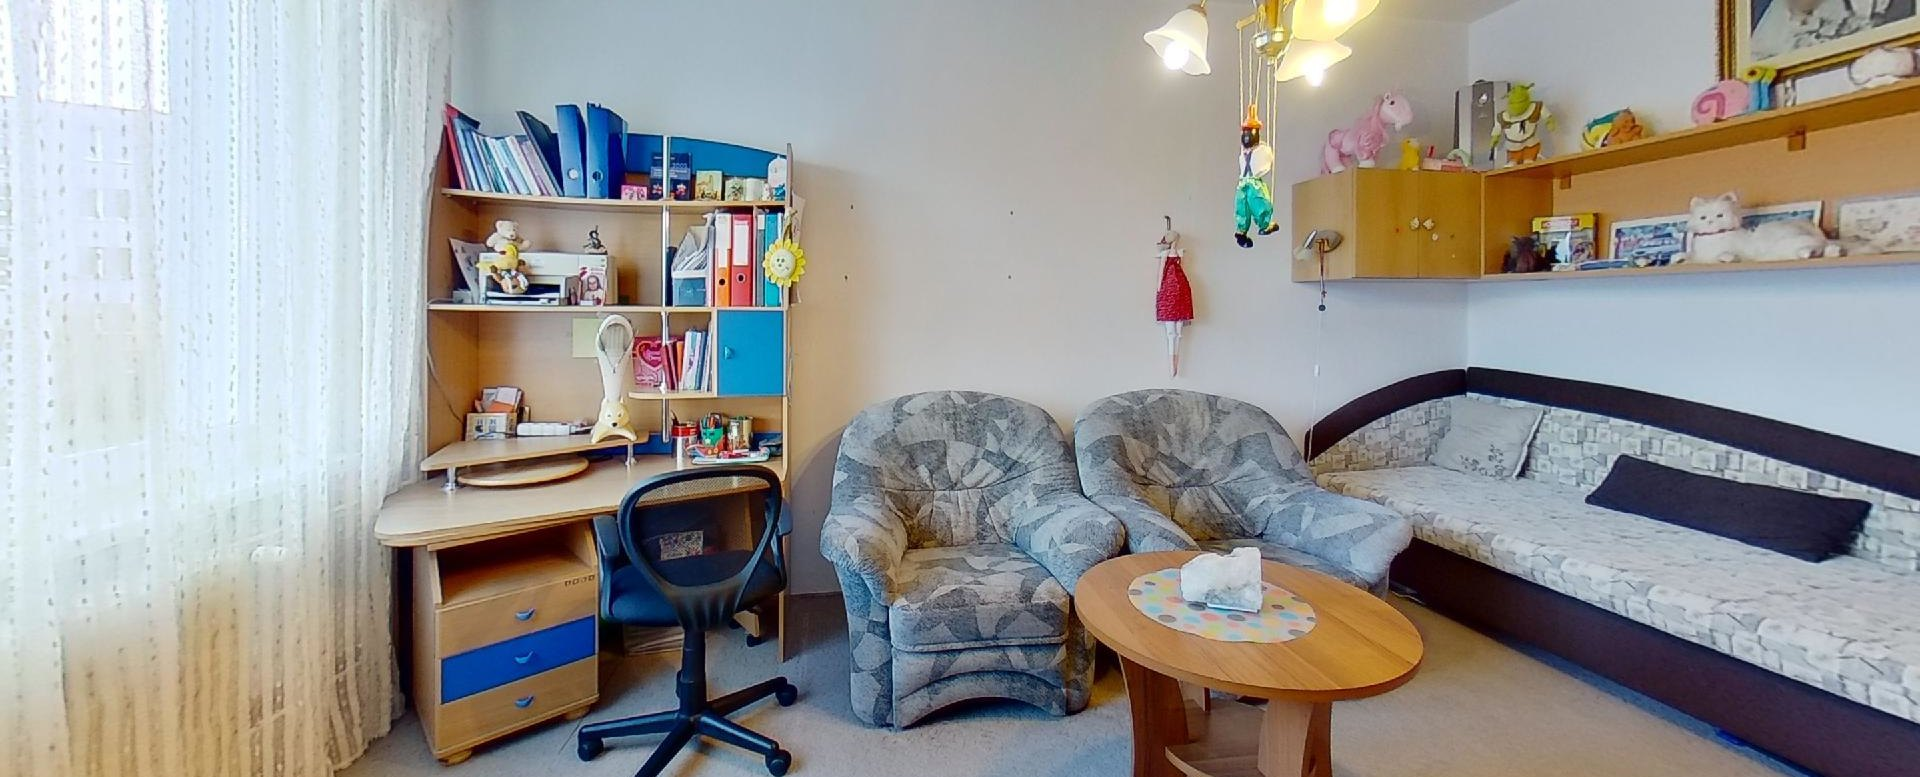 Písací stôl a posteľ v izbe